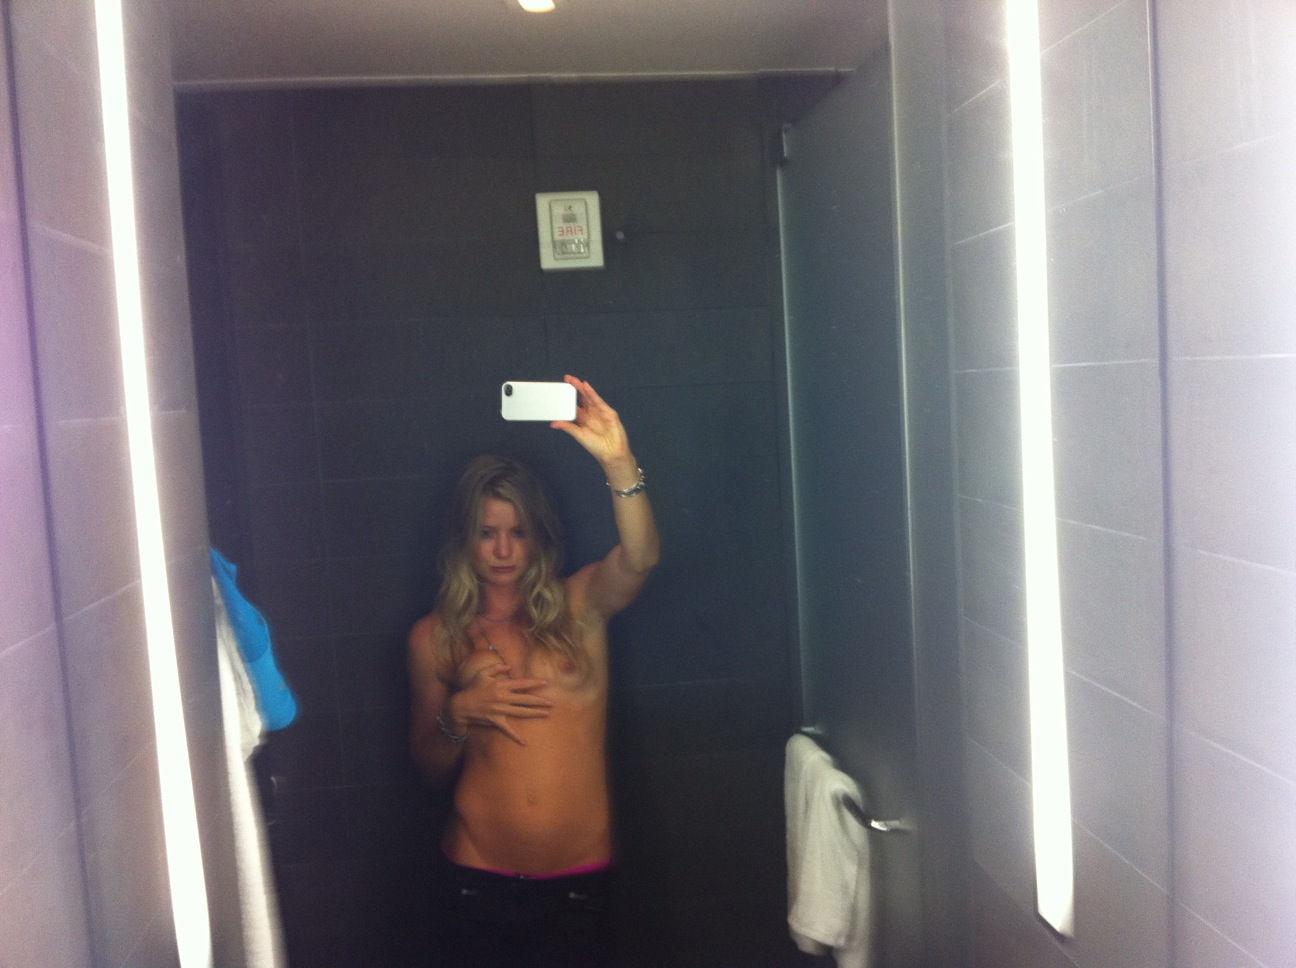 Hannah-Teter-Leaked-TheFappeningBlog.com-24.jpg